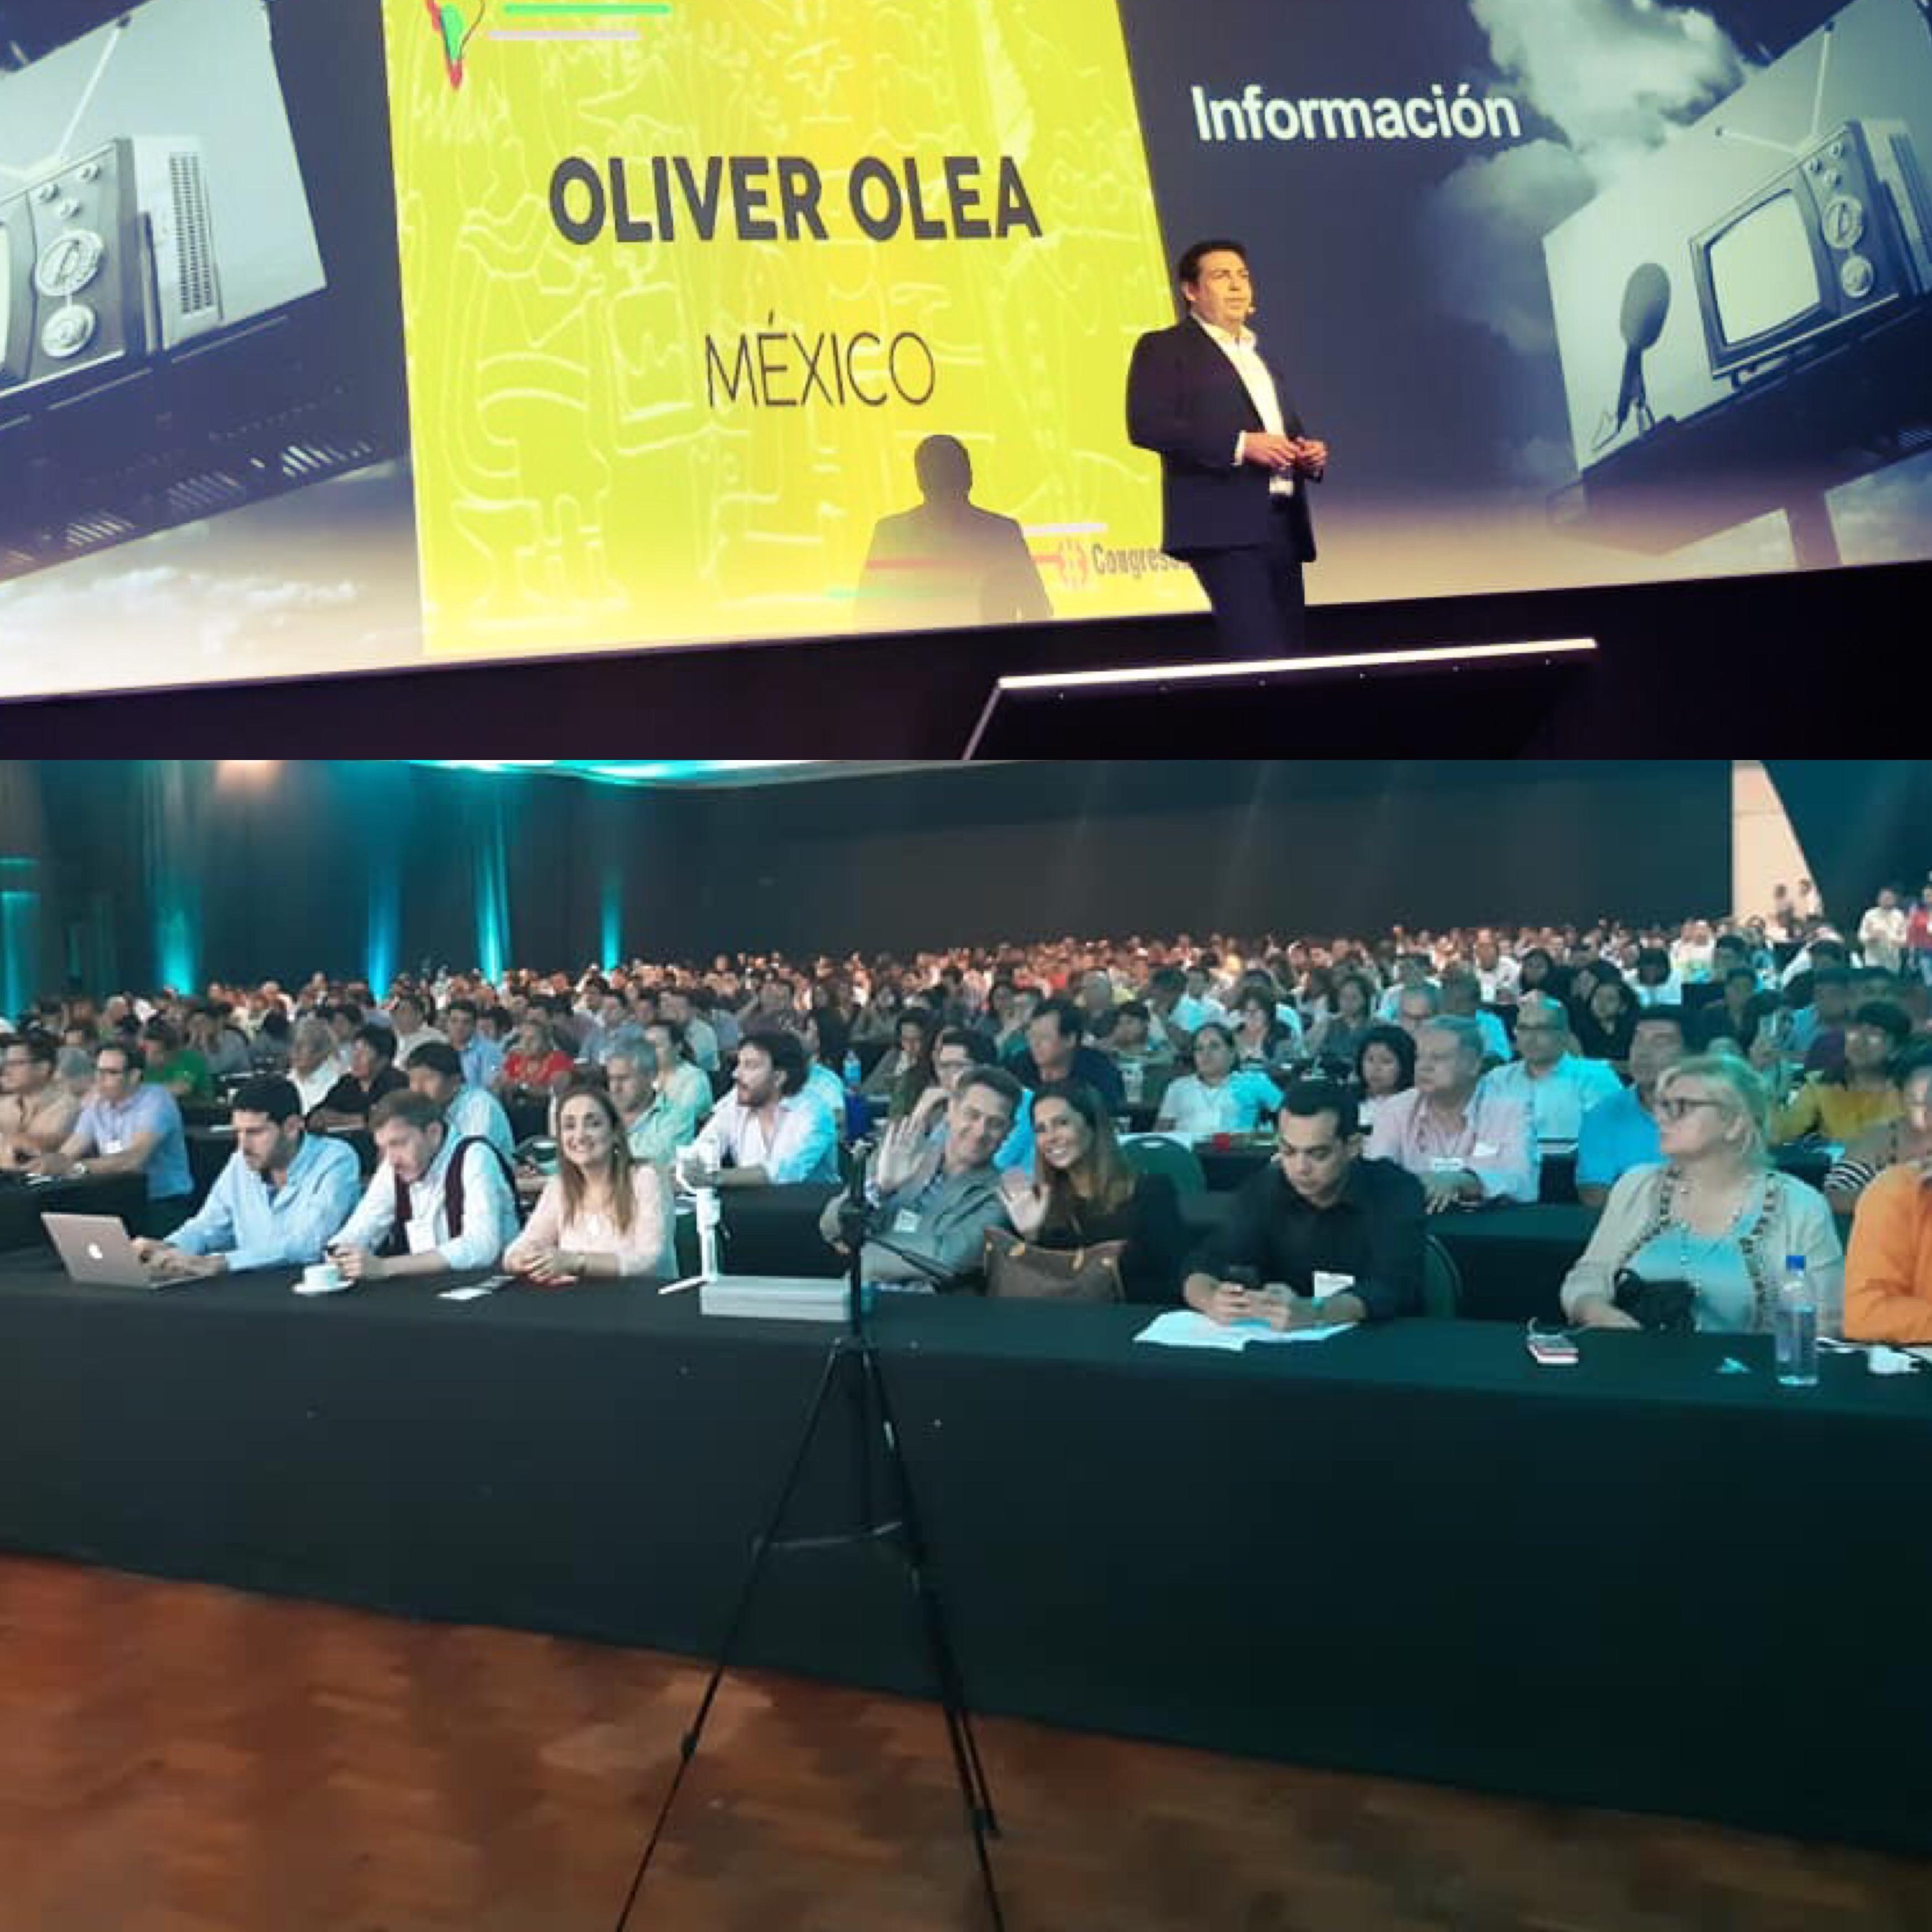 Oliver Olea